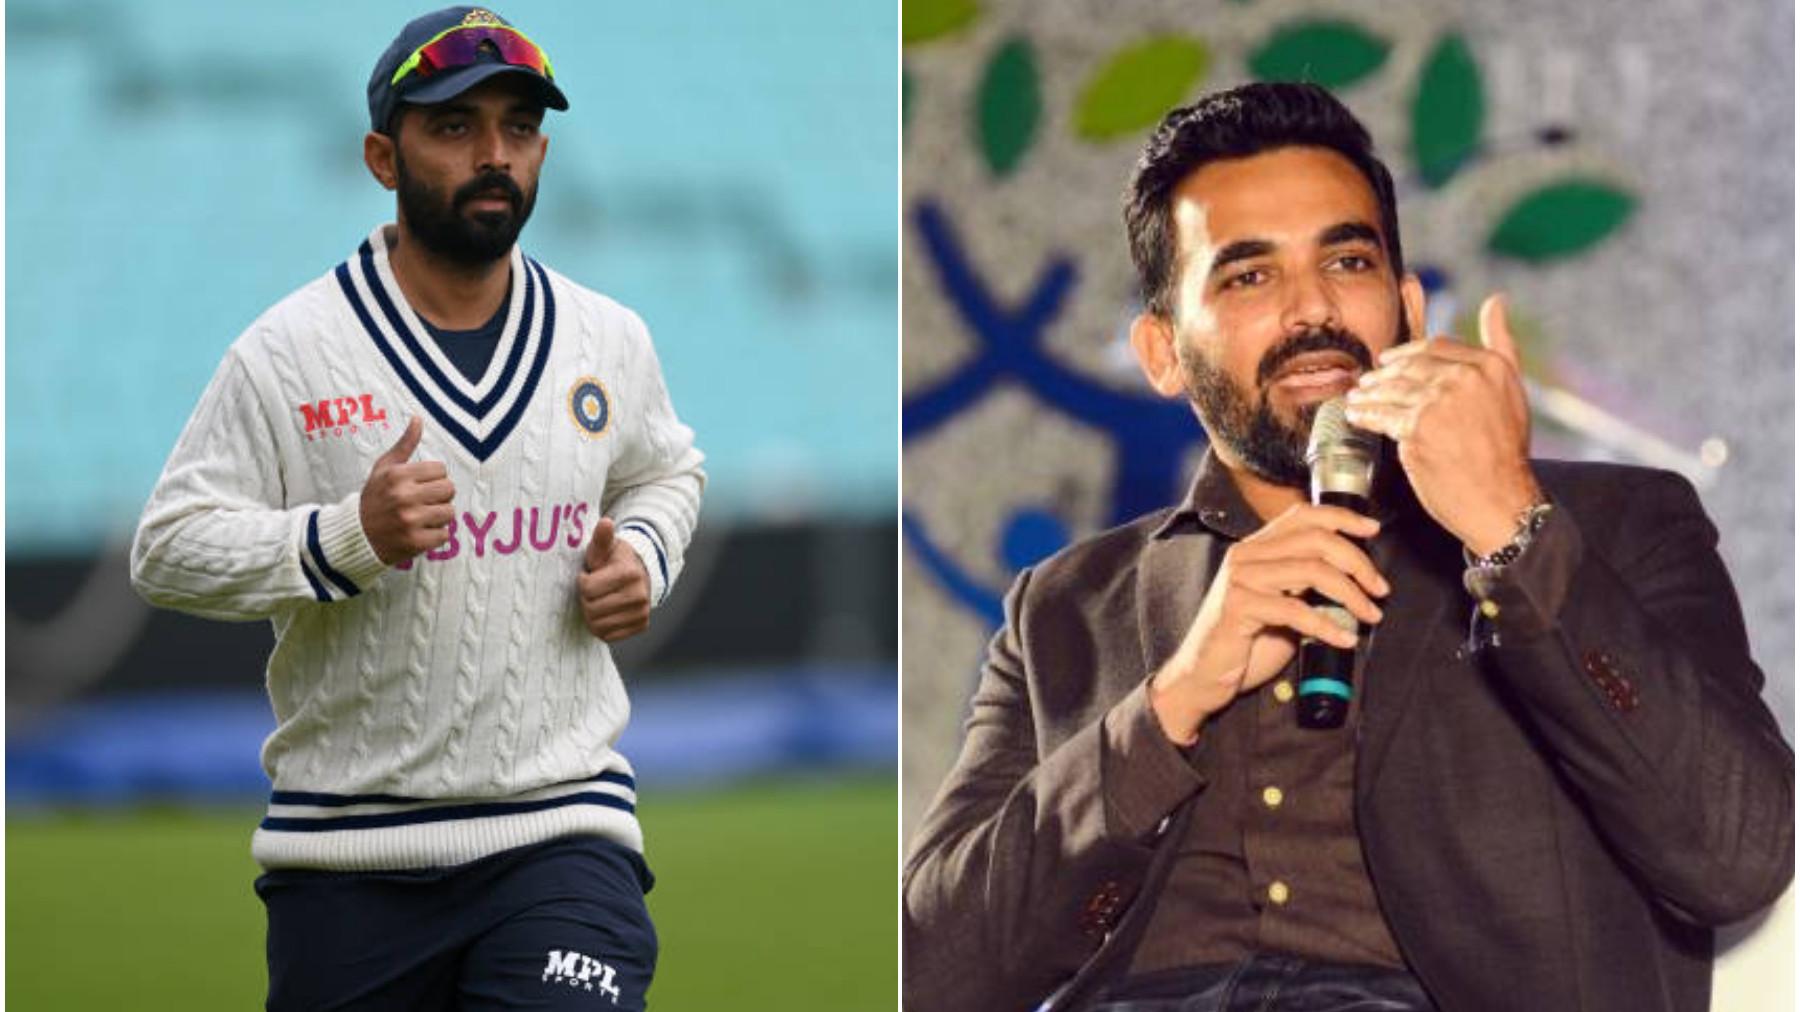 ENG v IND 2021: Ajinkya Rahane can play first-class cricket to regain his form - Zaheer Khan